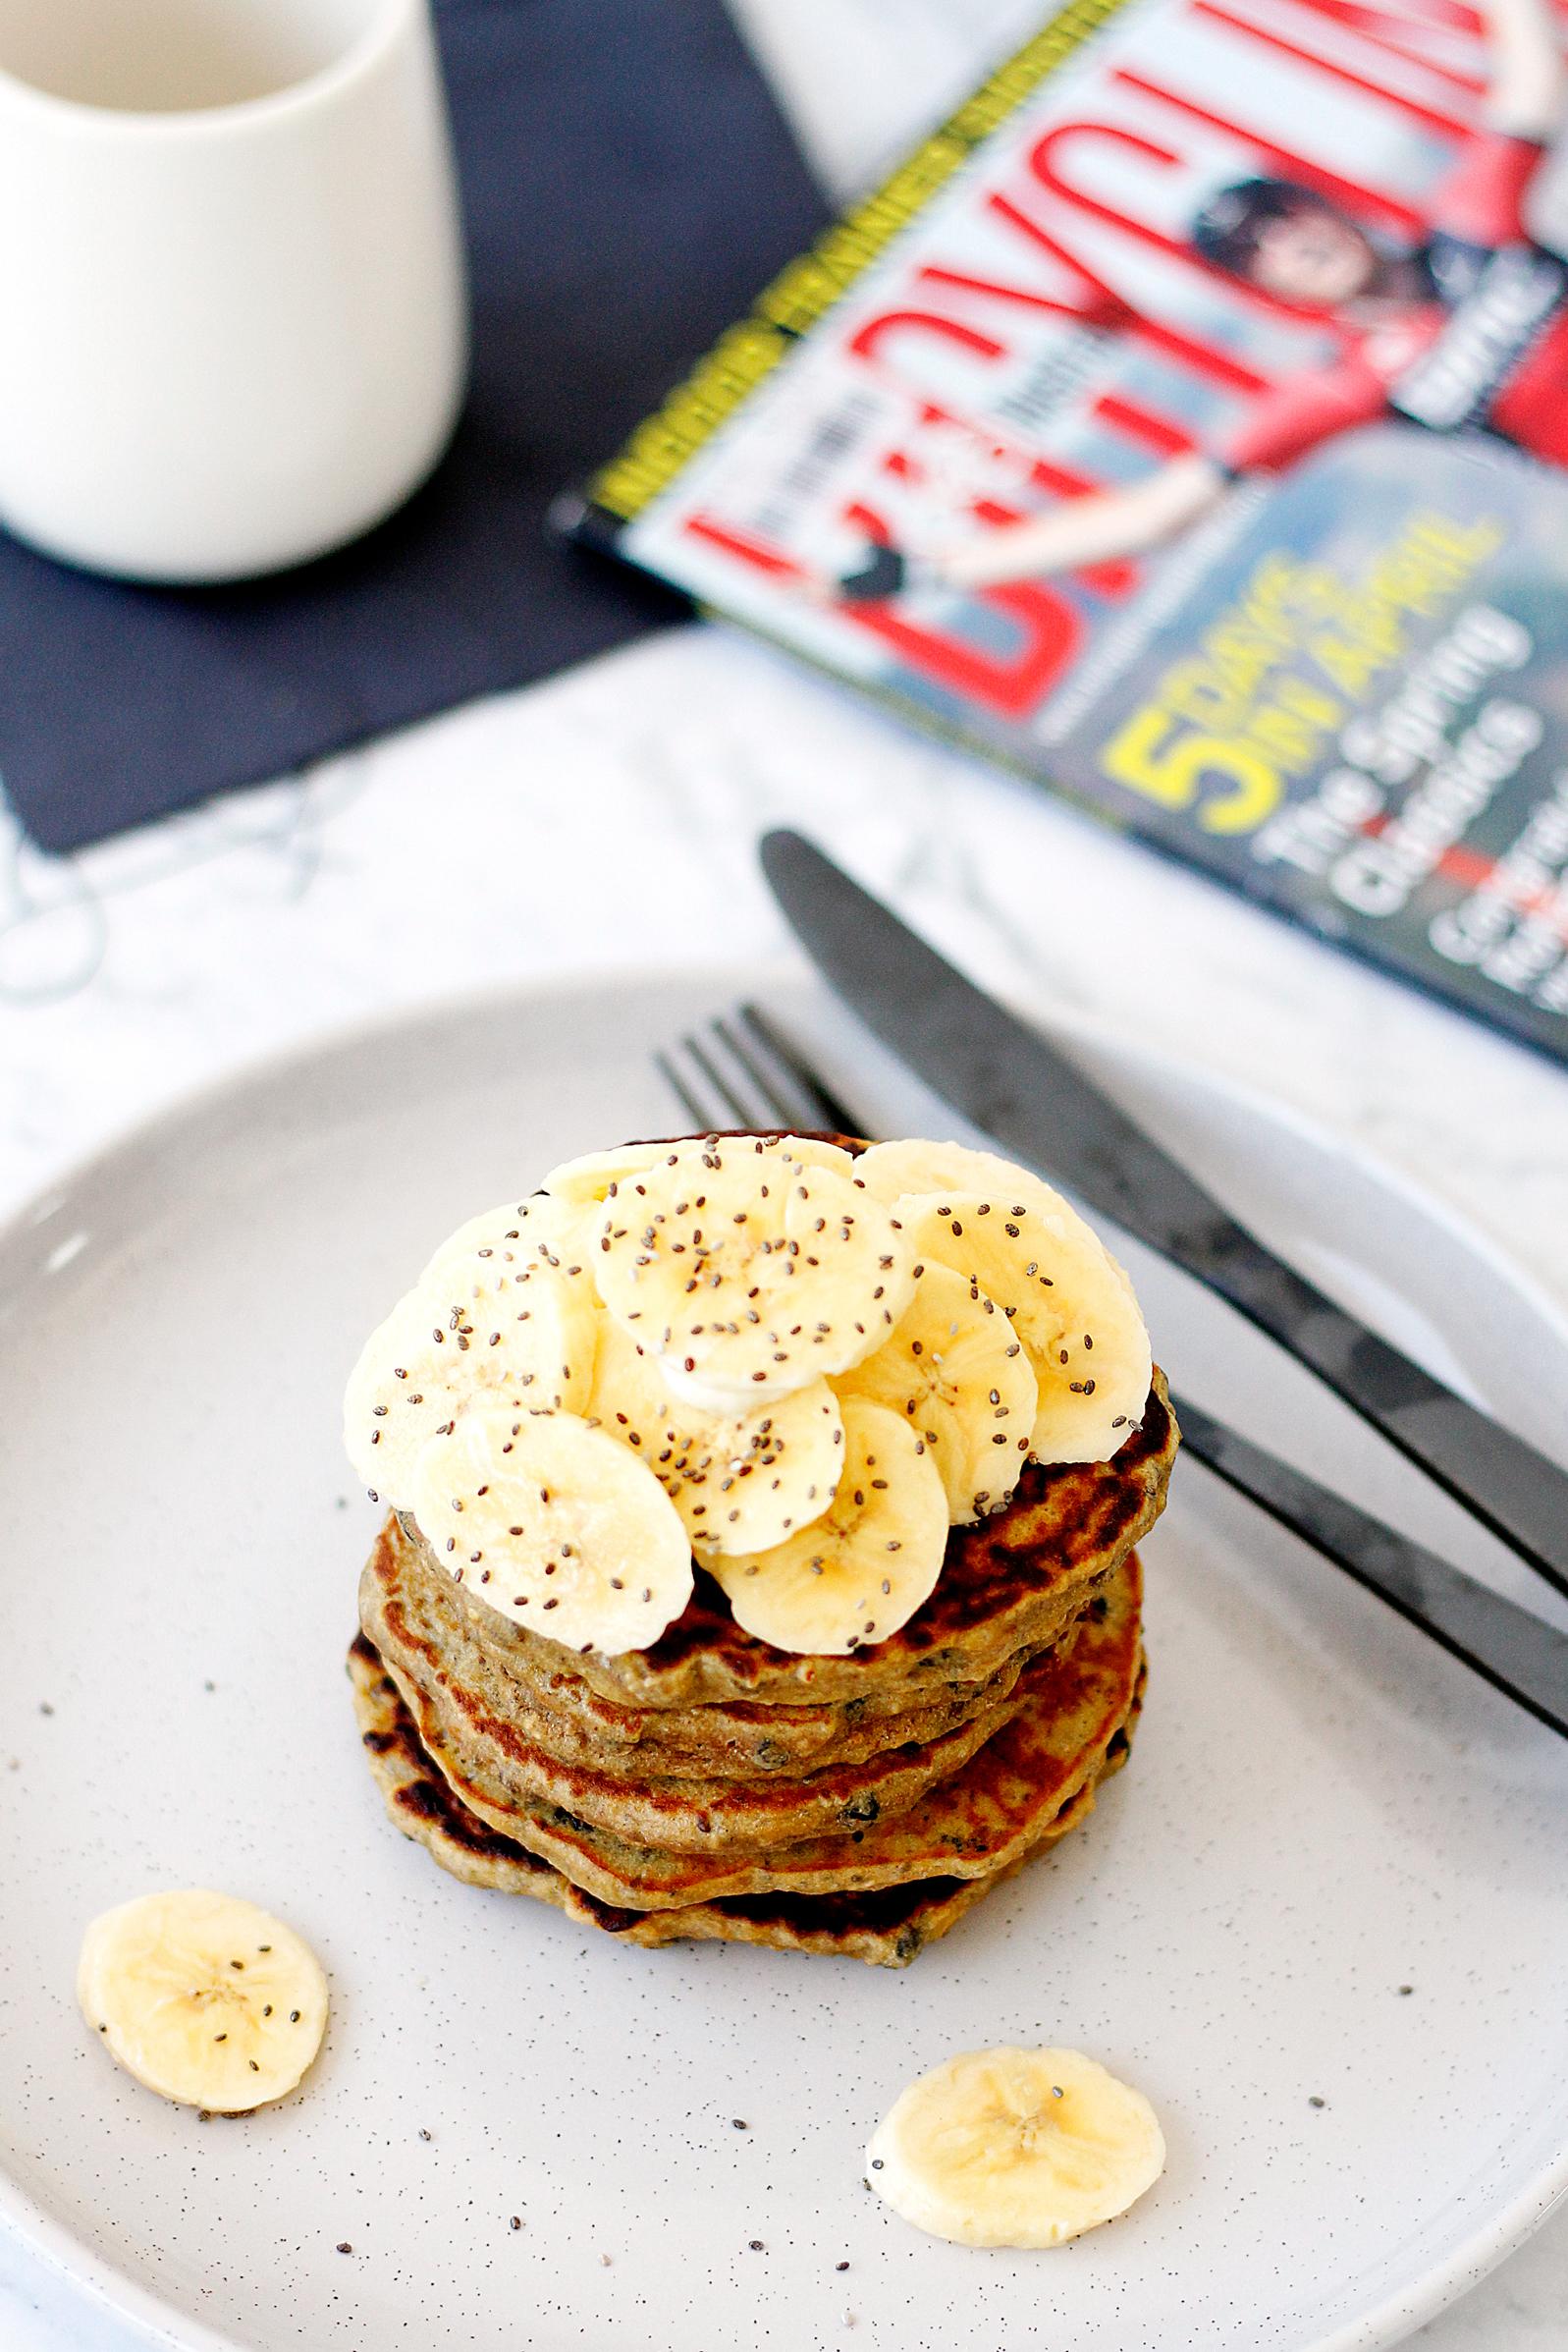 Kirrily's Buckwheat Banana Pancakes